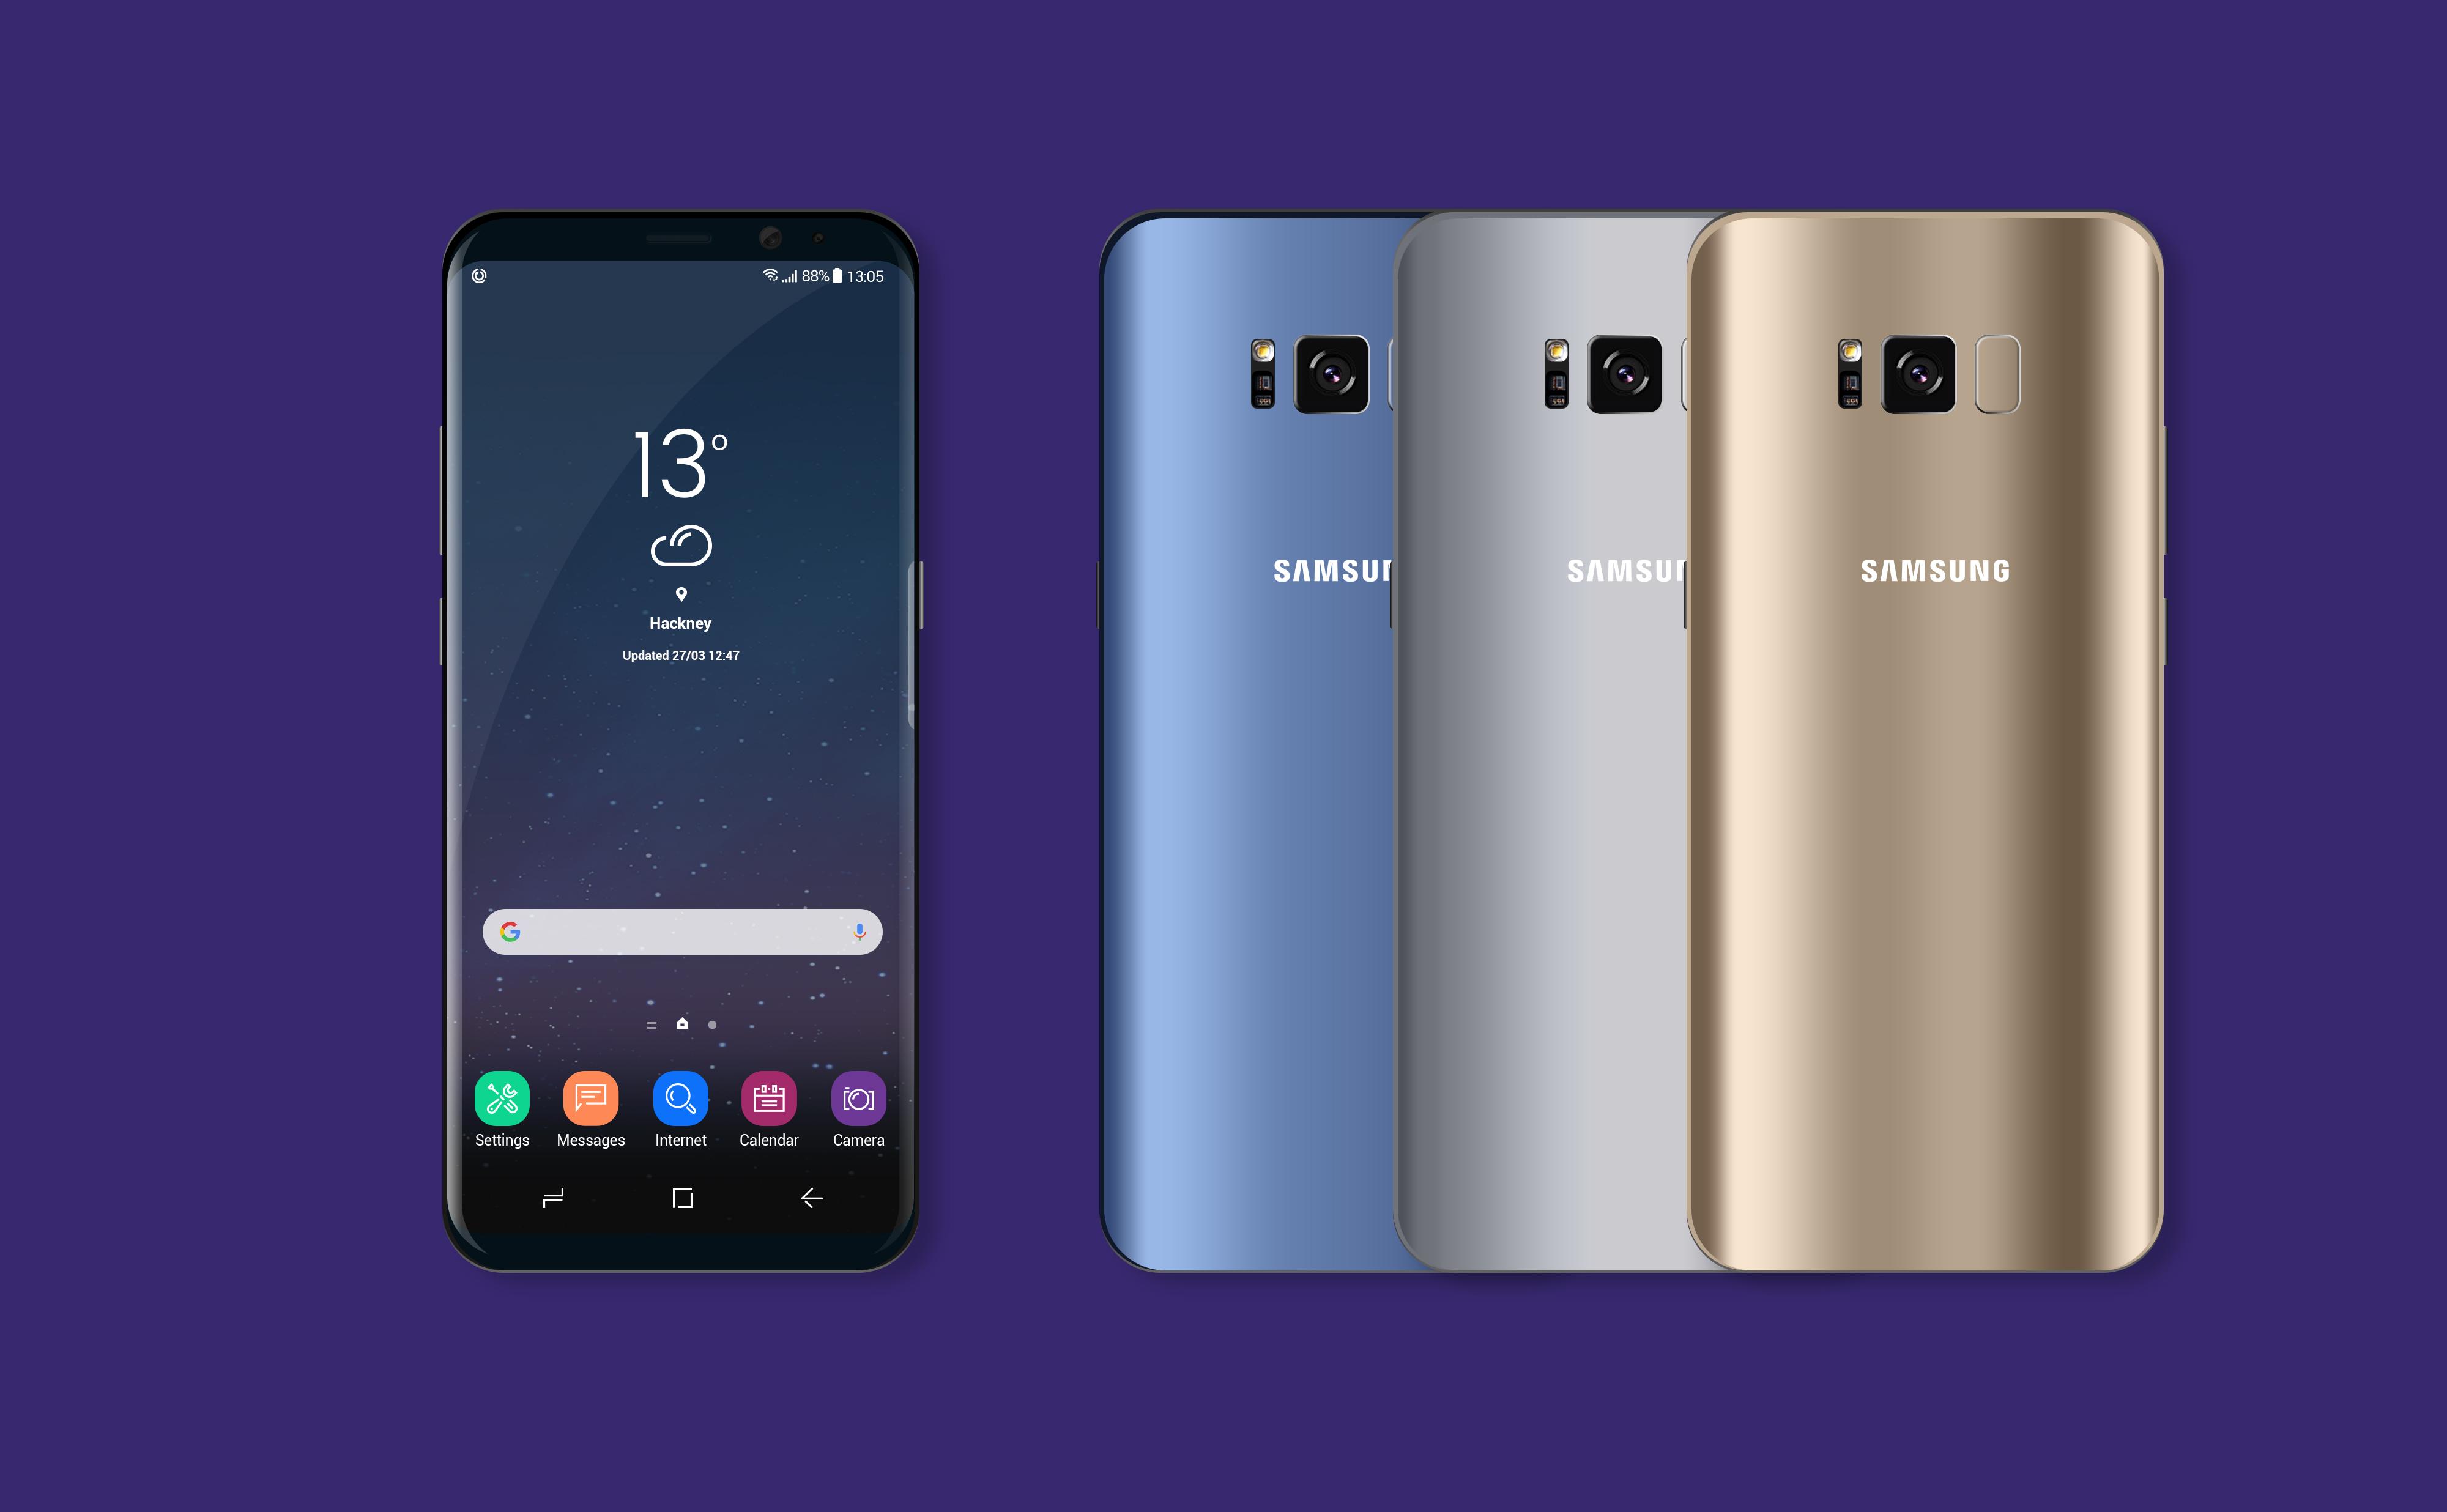 Samsung Galaxy S8 Landing Page Mockup PSD Free Download